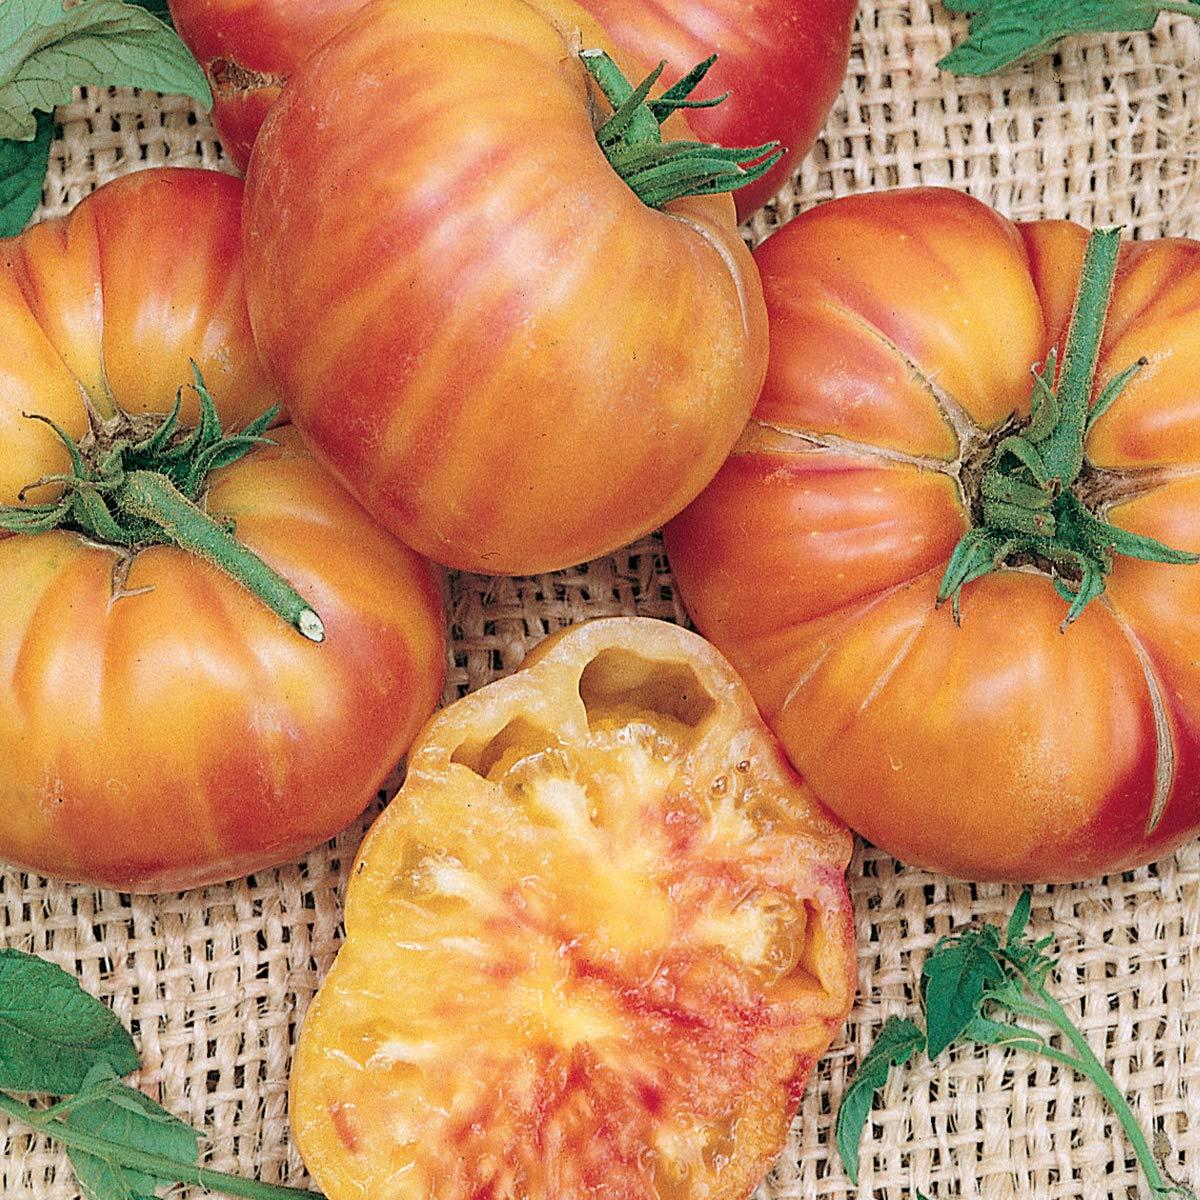 Burpee Mr. Stripey Heirloom   Beefsteak Slicing Tomato    , 3 Live Plants   2 1/2'' Pot